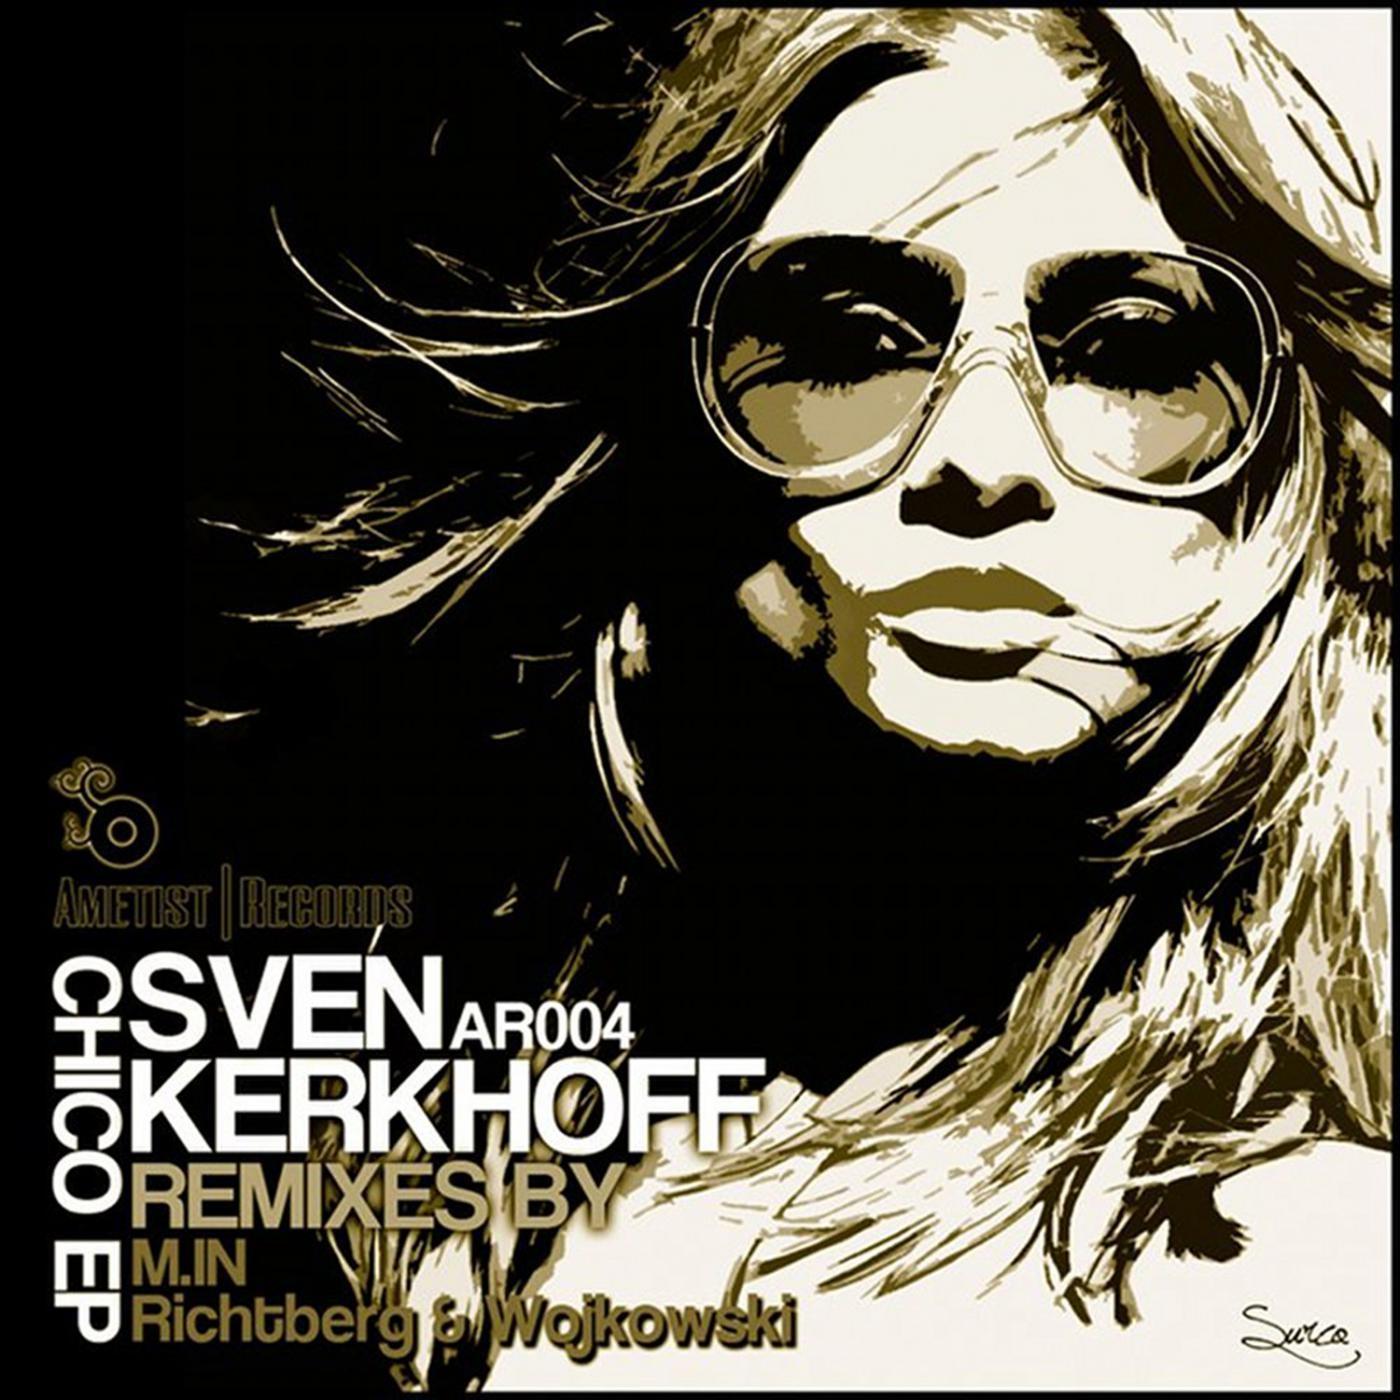 Sven Kerkhoff - Chico (M.in Remix)